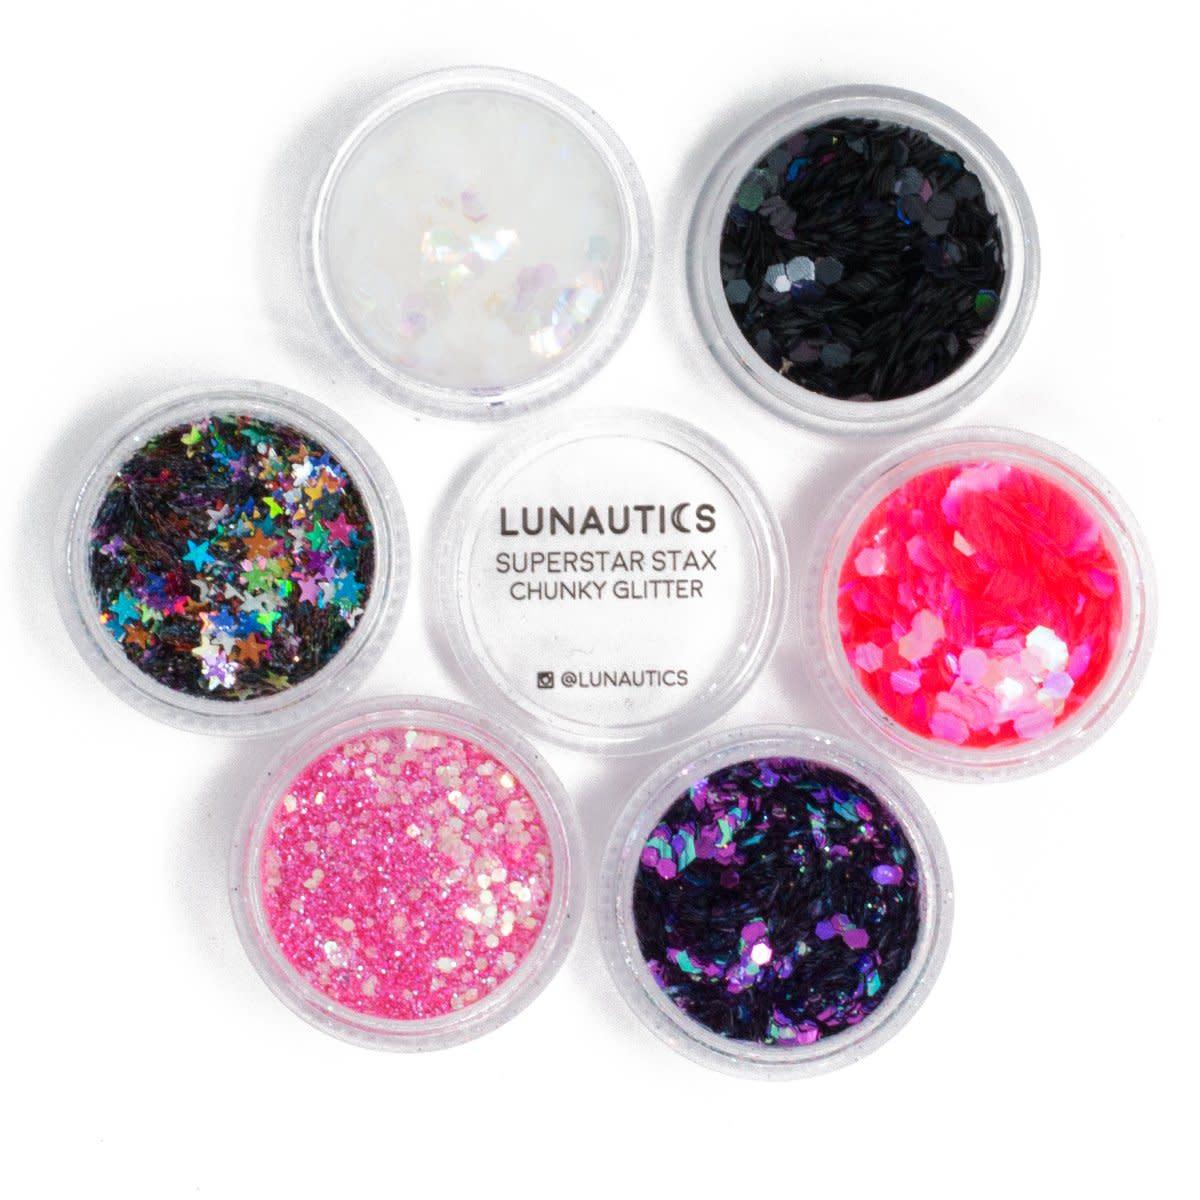 Lunauticsbio-degradable glitter!